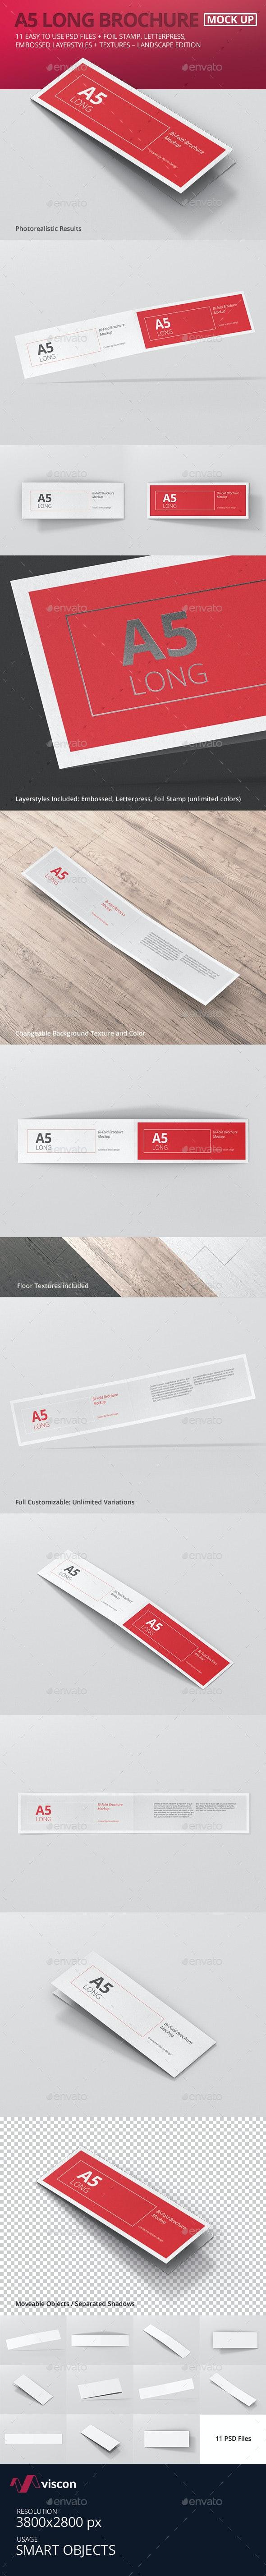 A5 Long Bi-Fold Brochure Mock-Up Landscape - Brochures Print